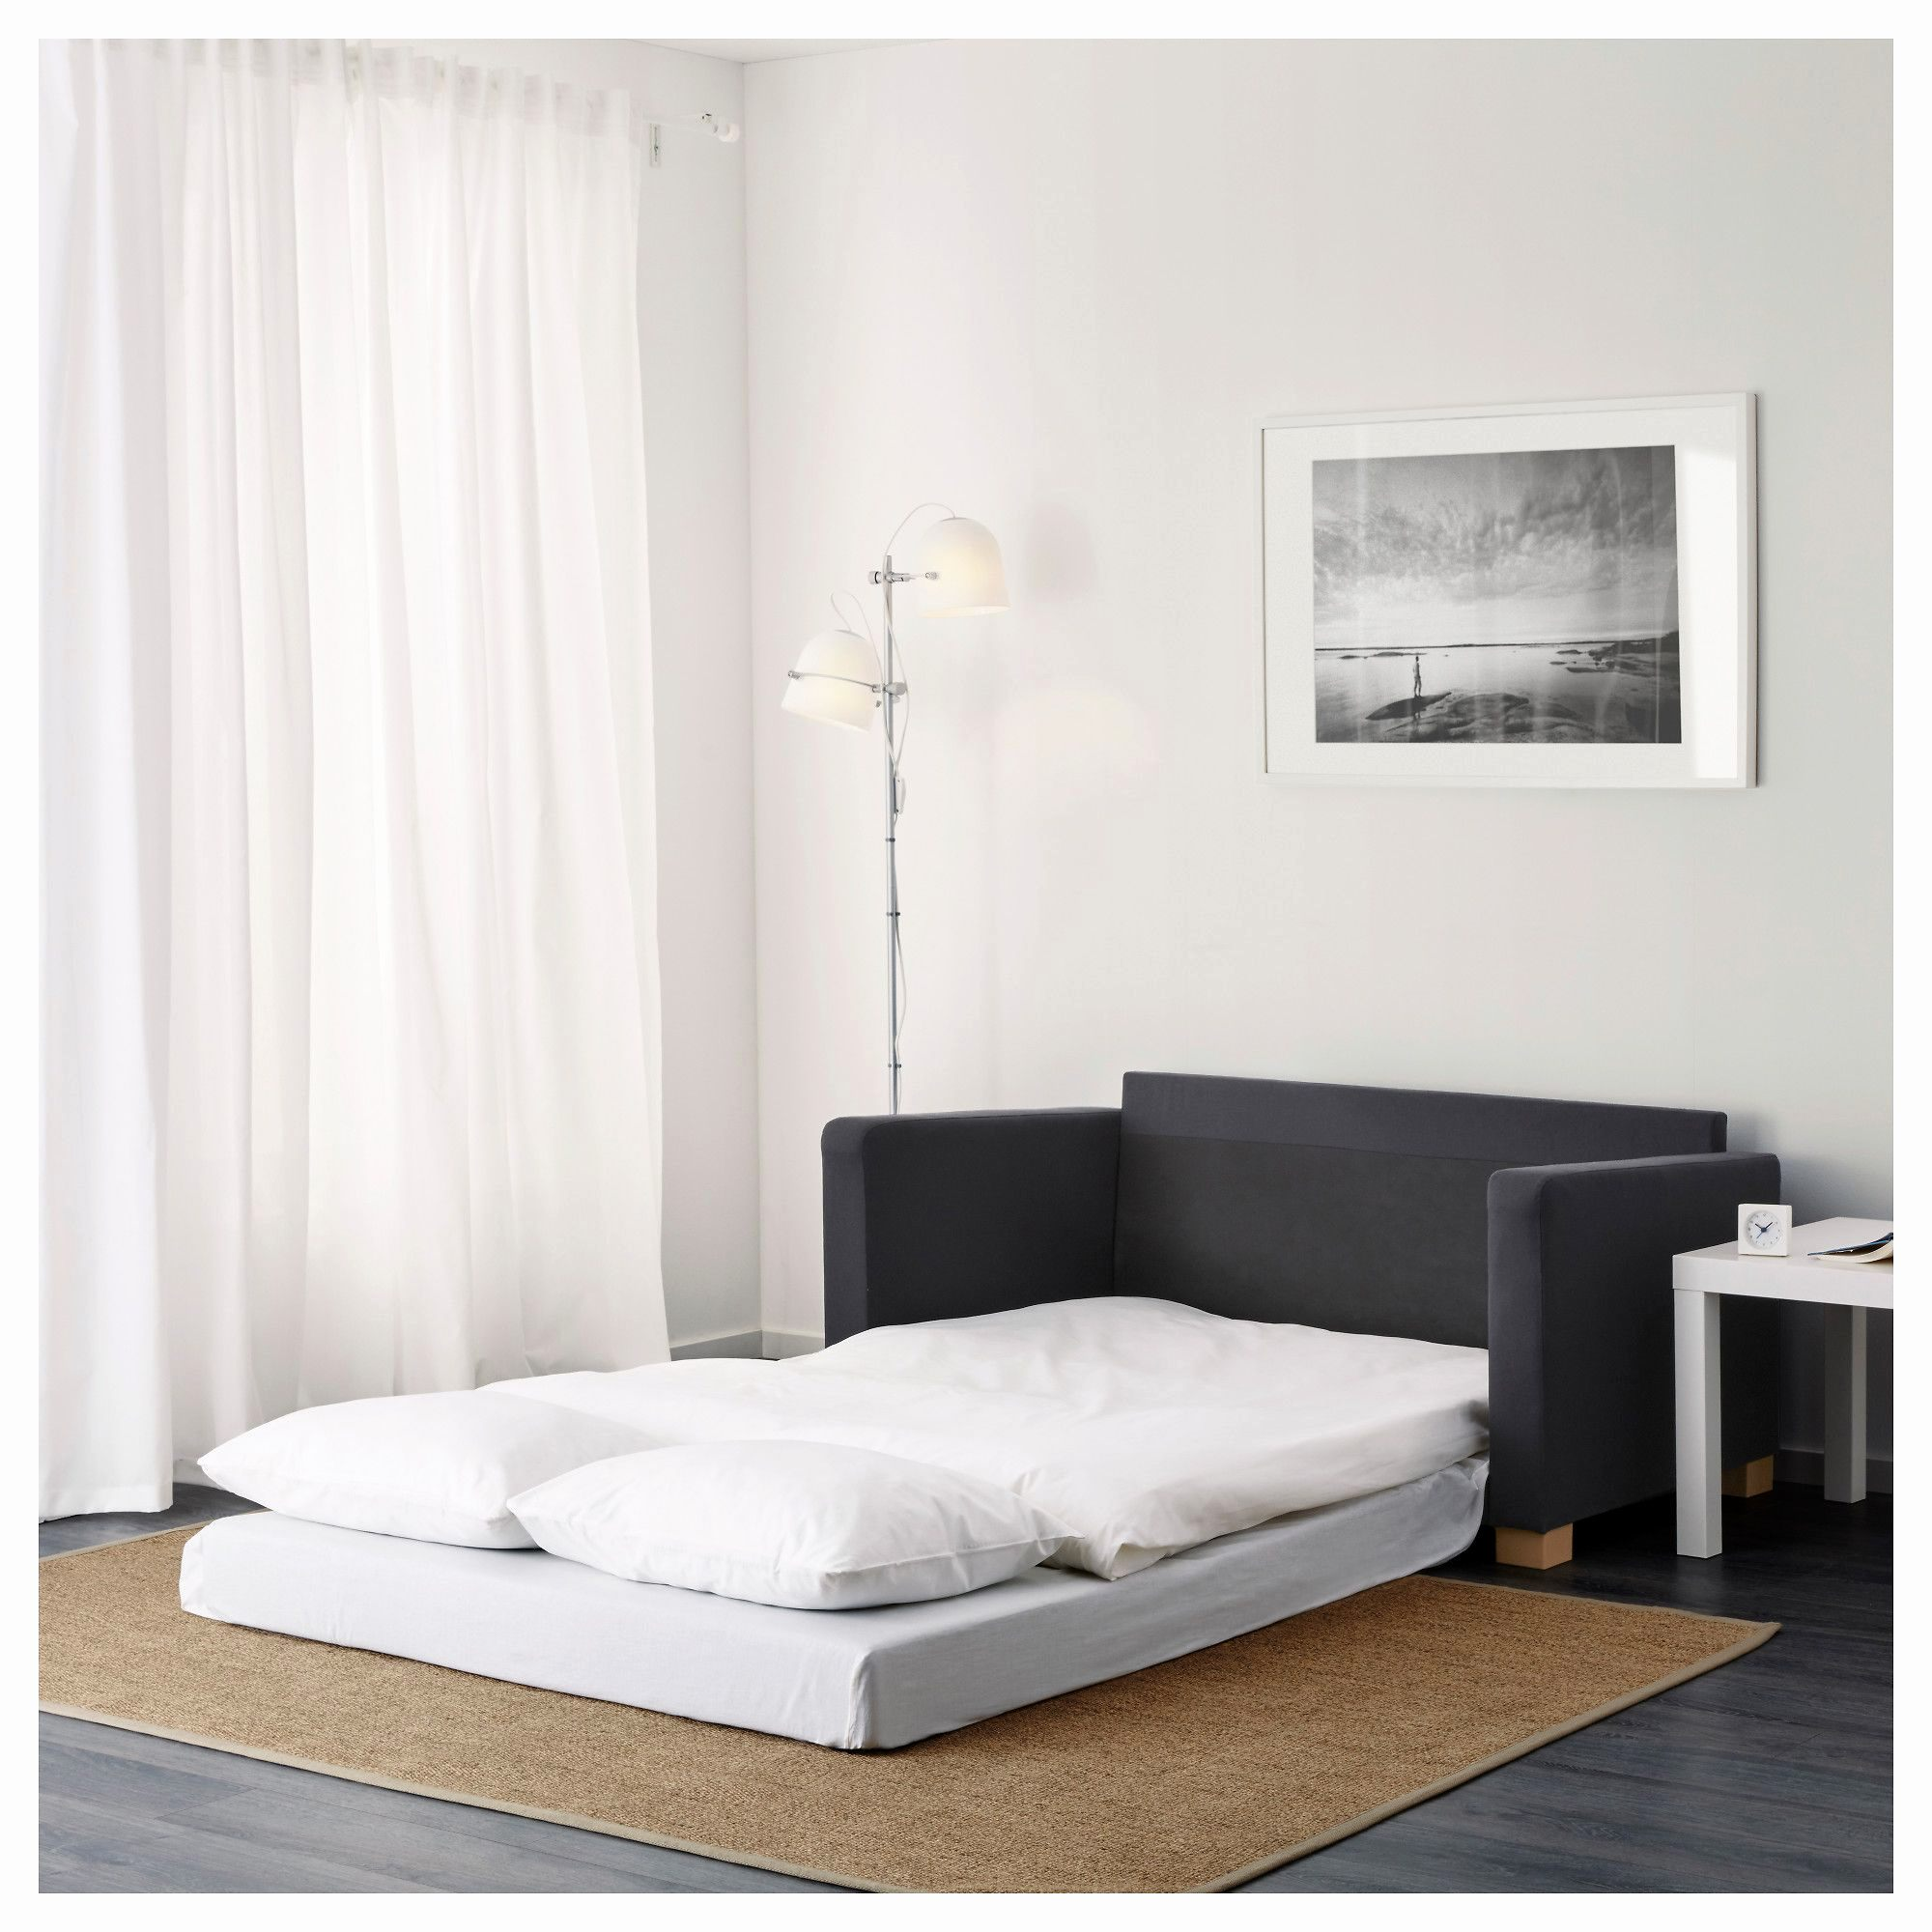 Lit Ikea Gigogne Impressionnant Banquette Lit Ikea Inspirant Interior 50 Inspirational Ikea sofa